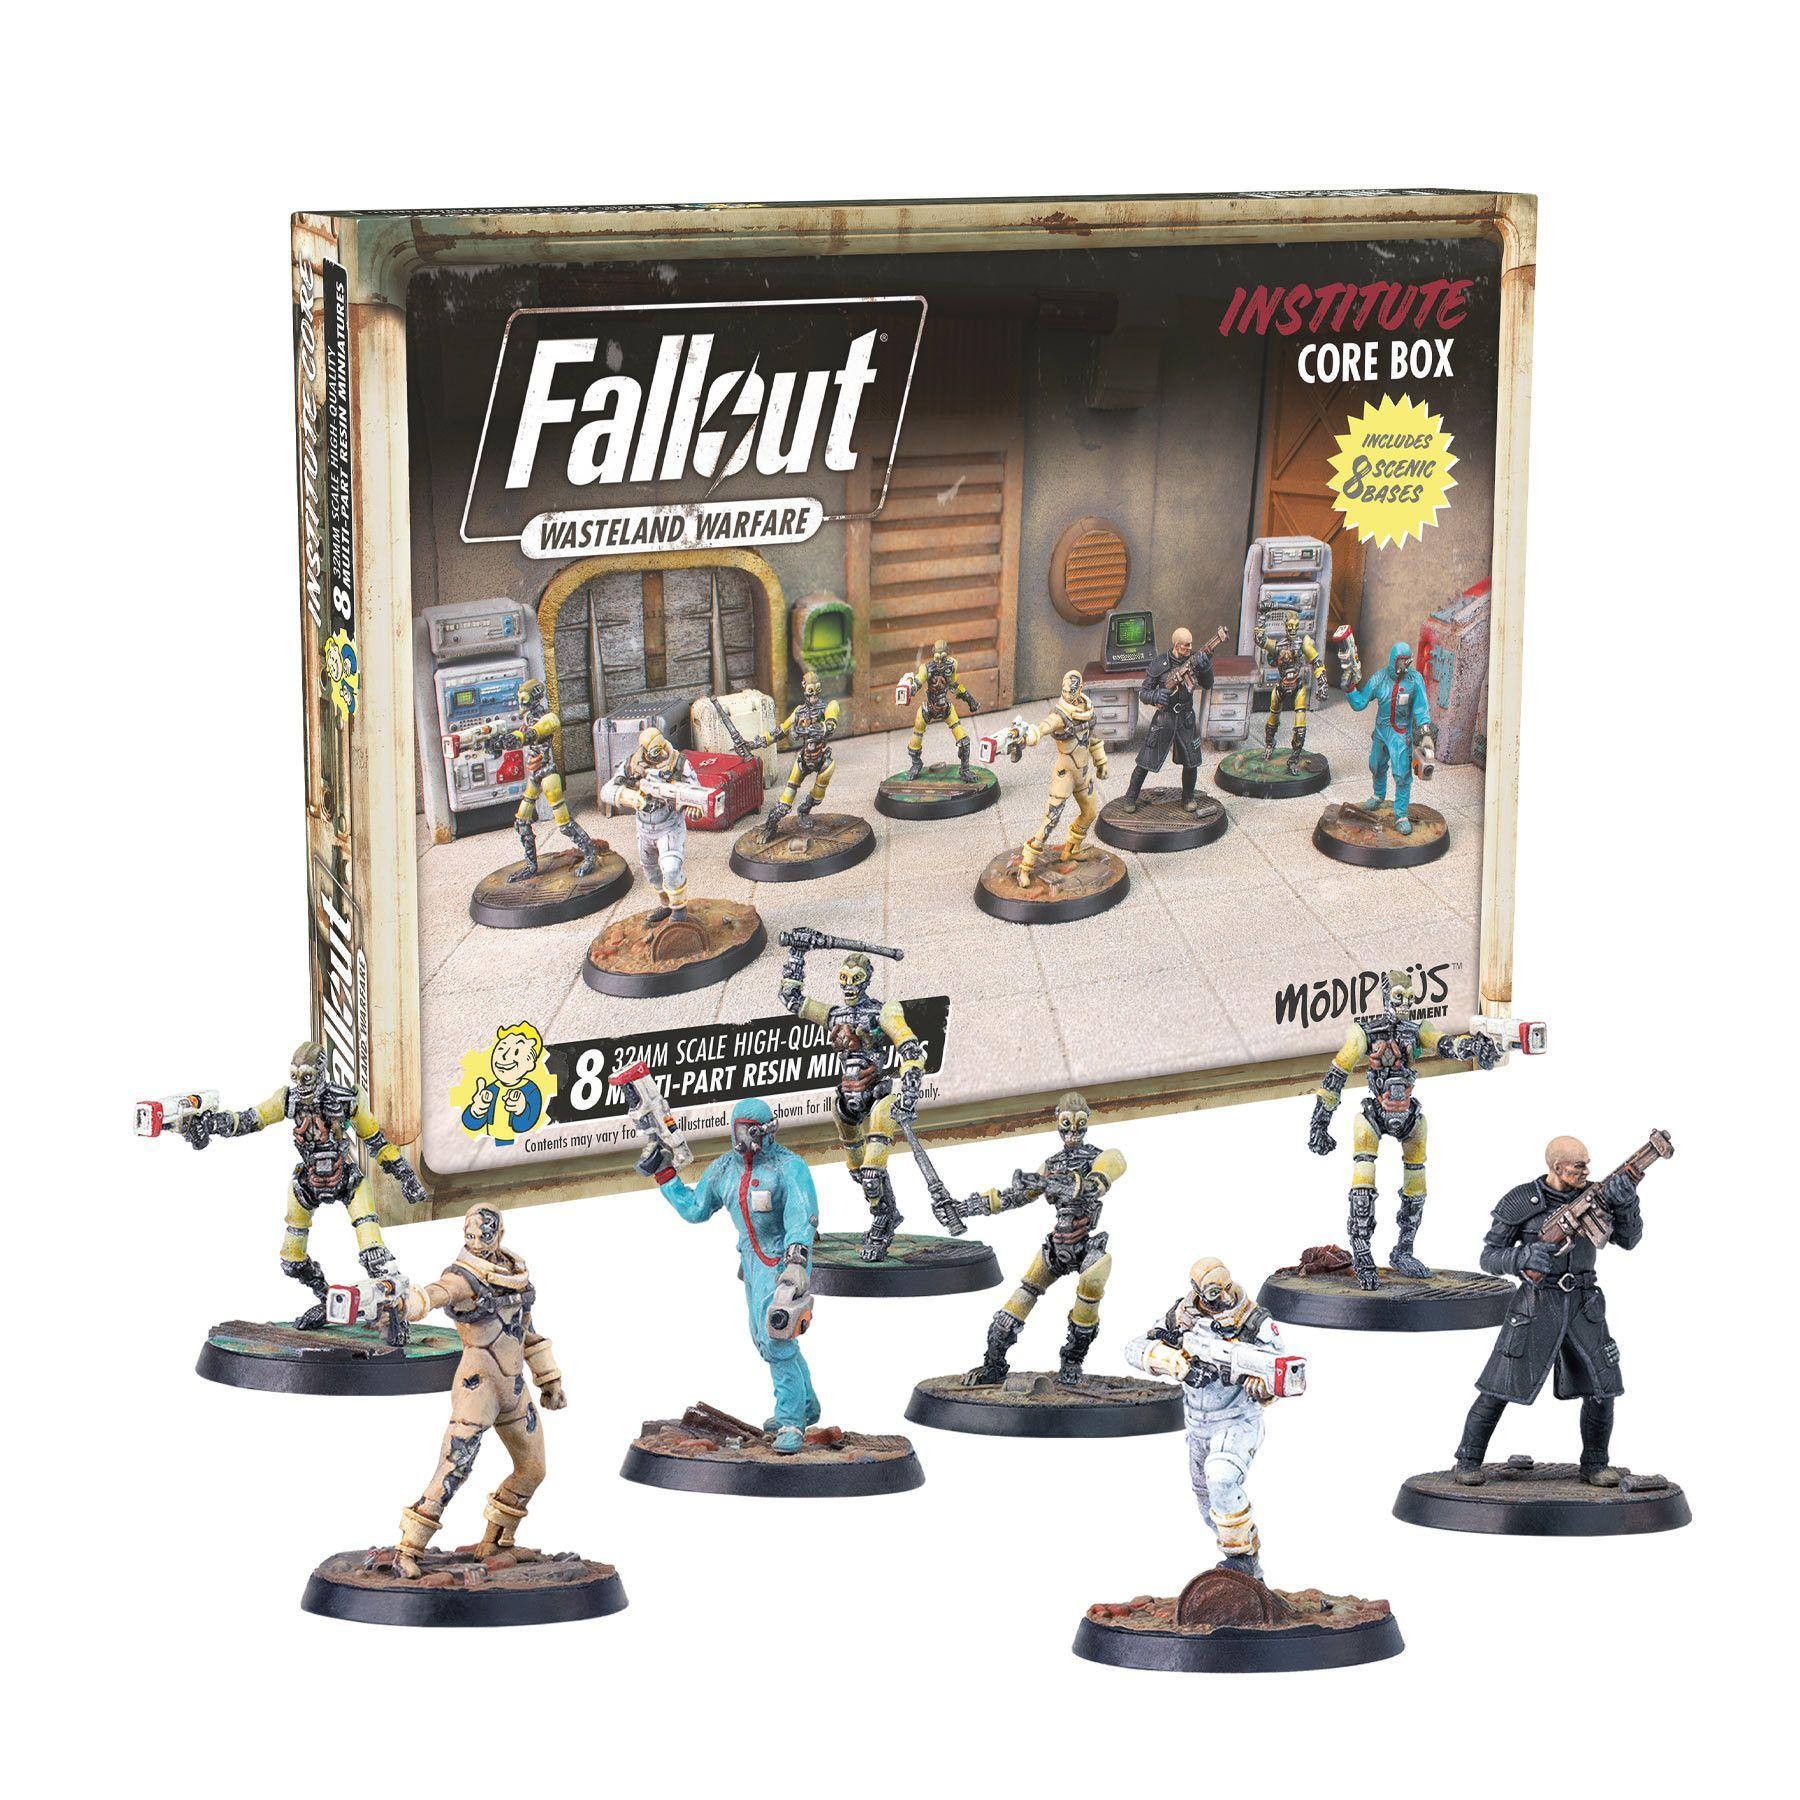 Fallout Wasteland Warfare Institute Core Box